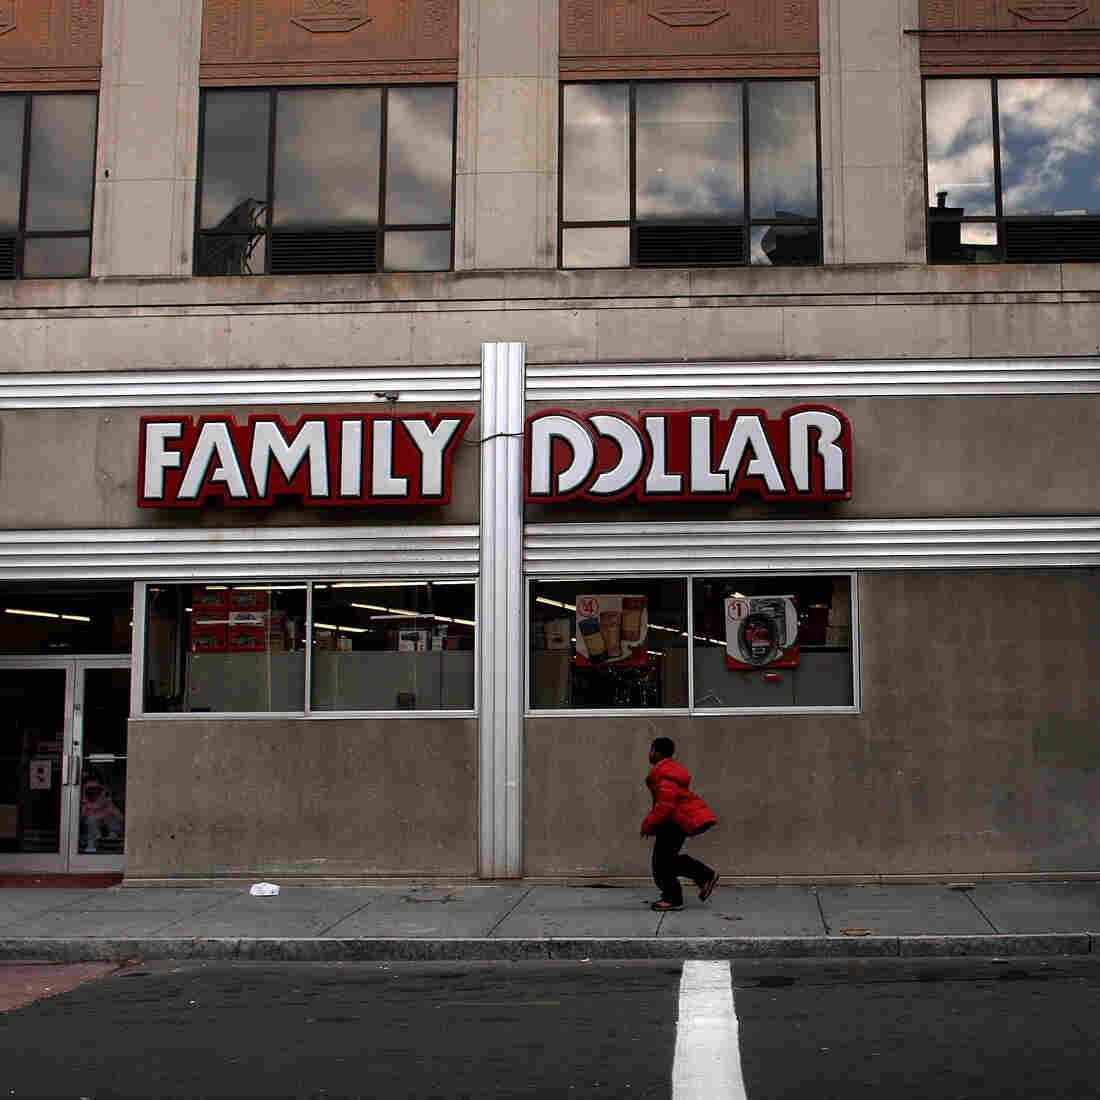 Dollar Tree To Buy Family Dollar In $8.5 Billion Deal